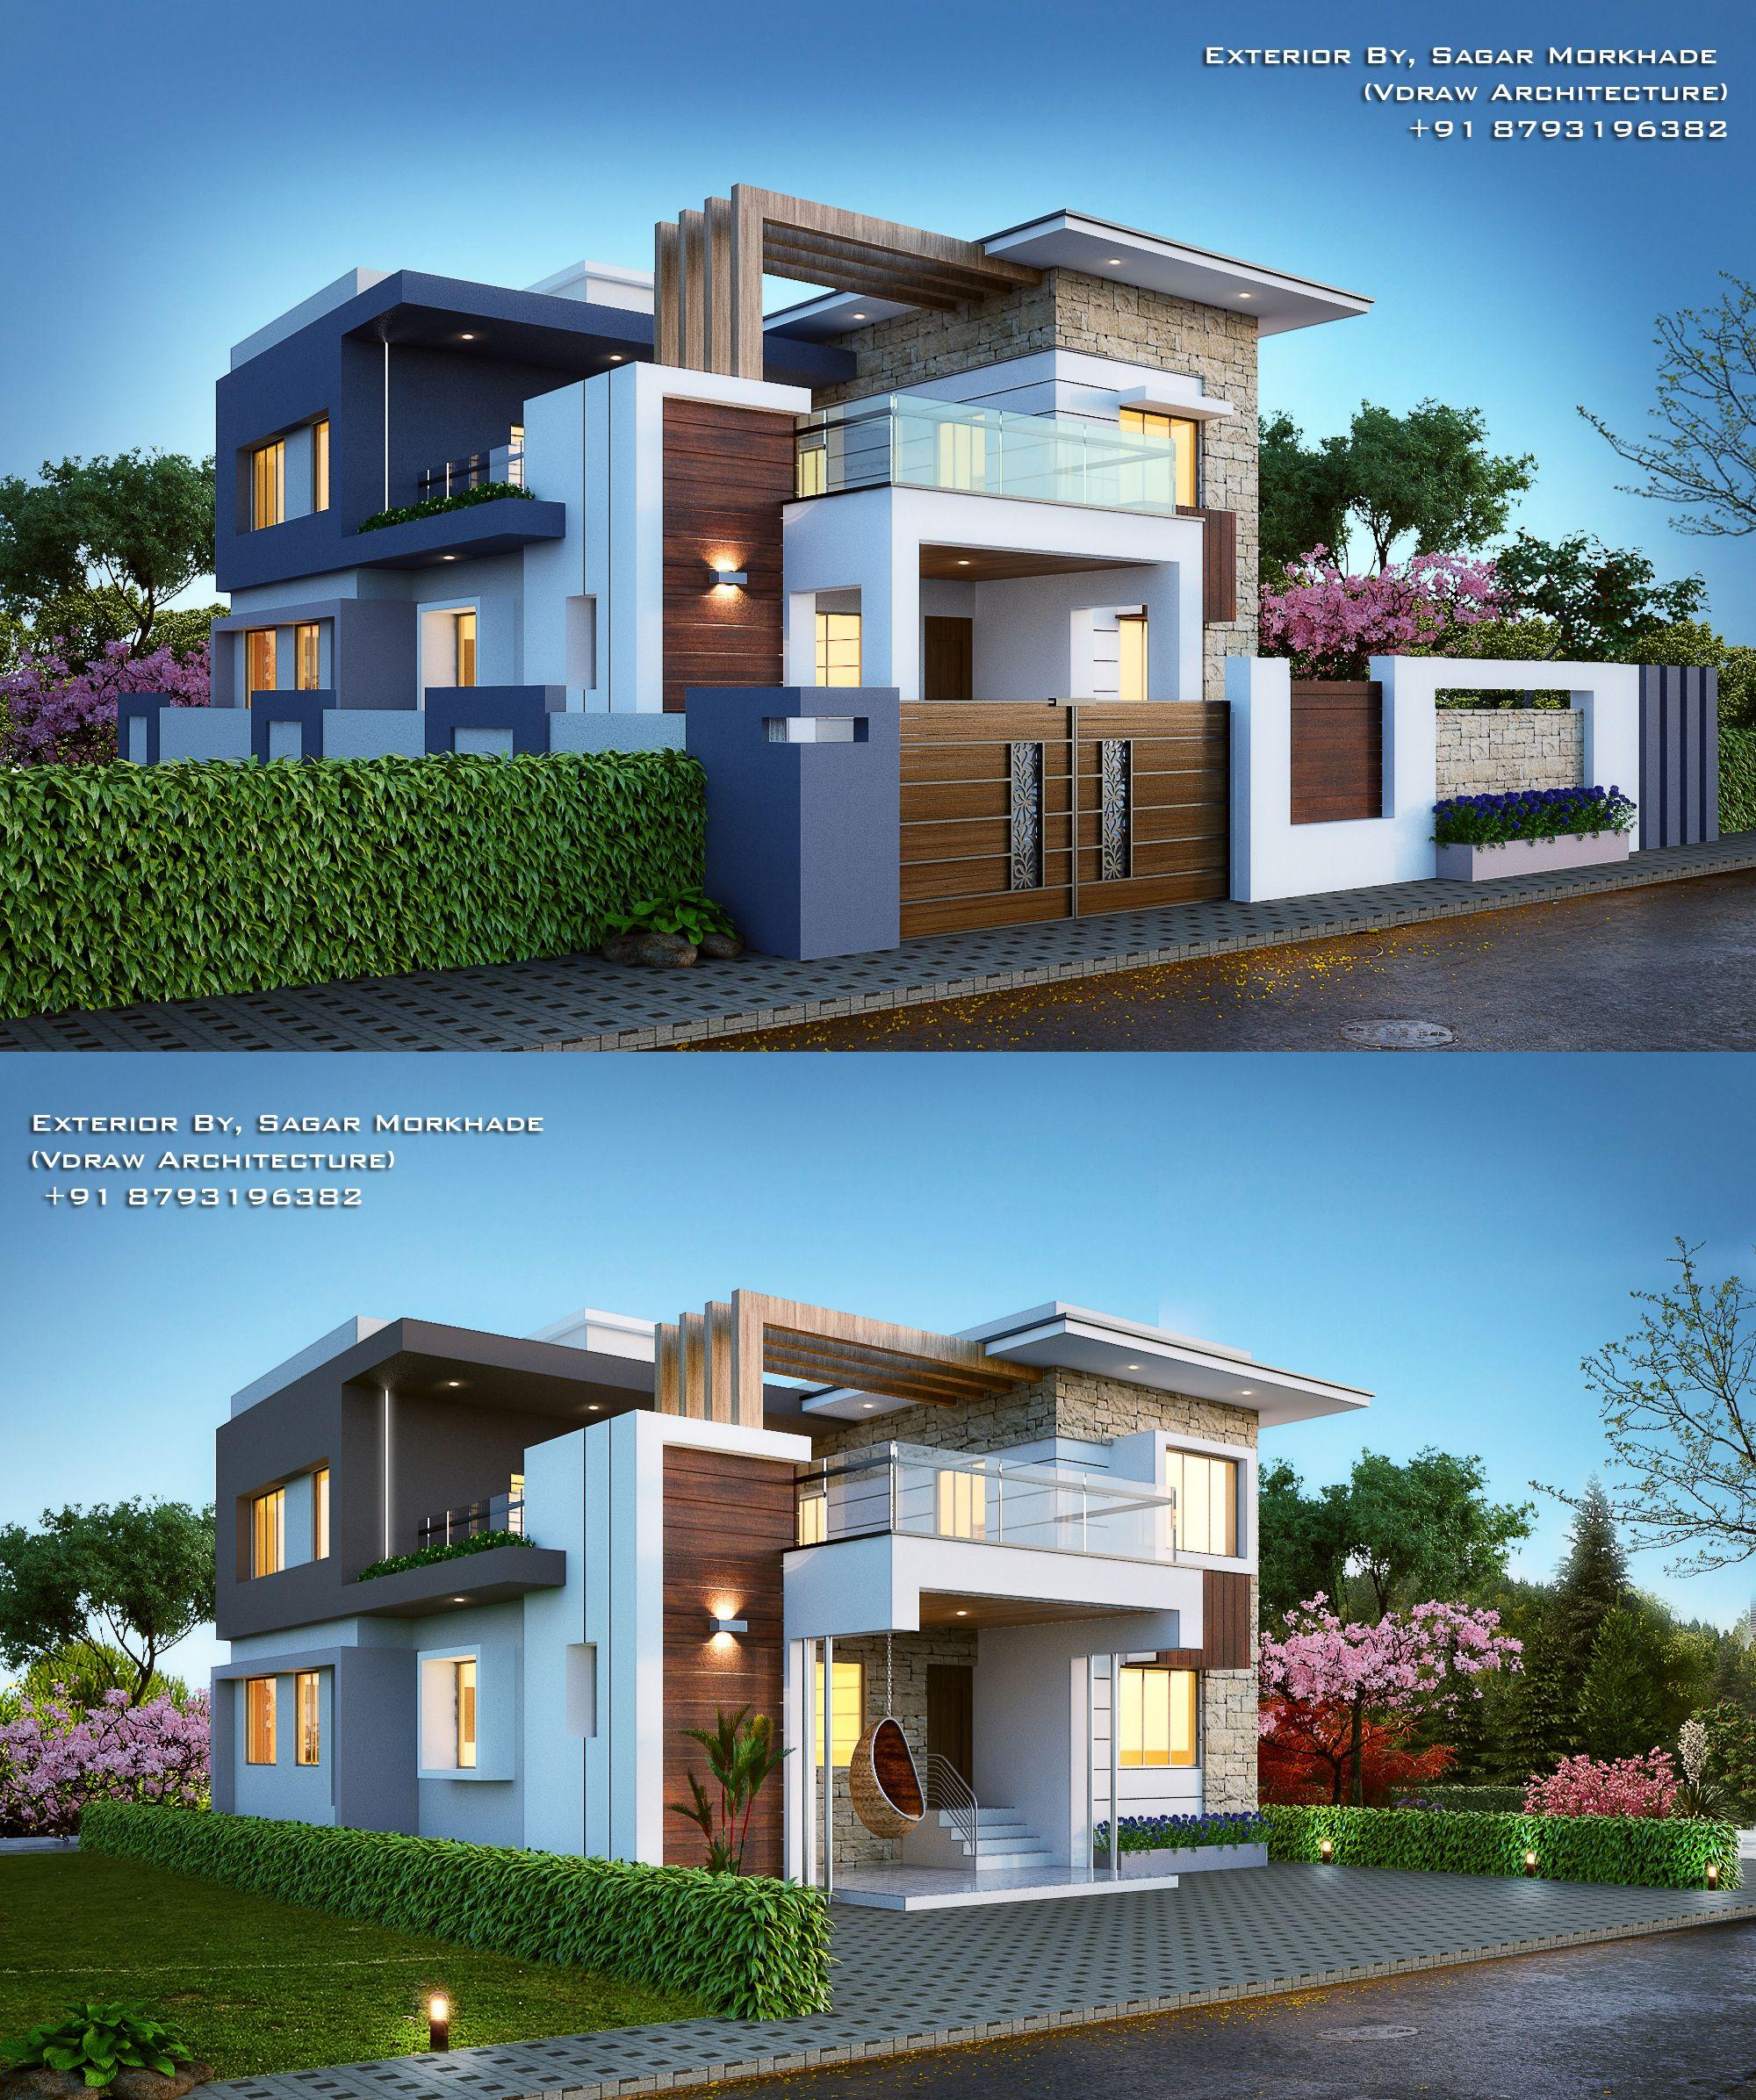 Modern House Bungalow Exterior By Sagar Morkhade Vdraw: Lego Ideas Product Ideas Everholm A Modern